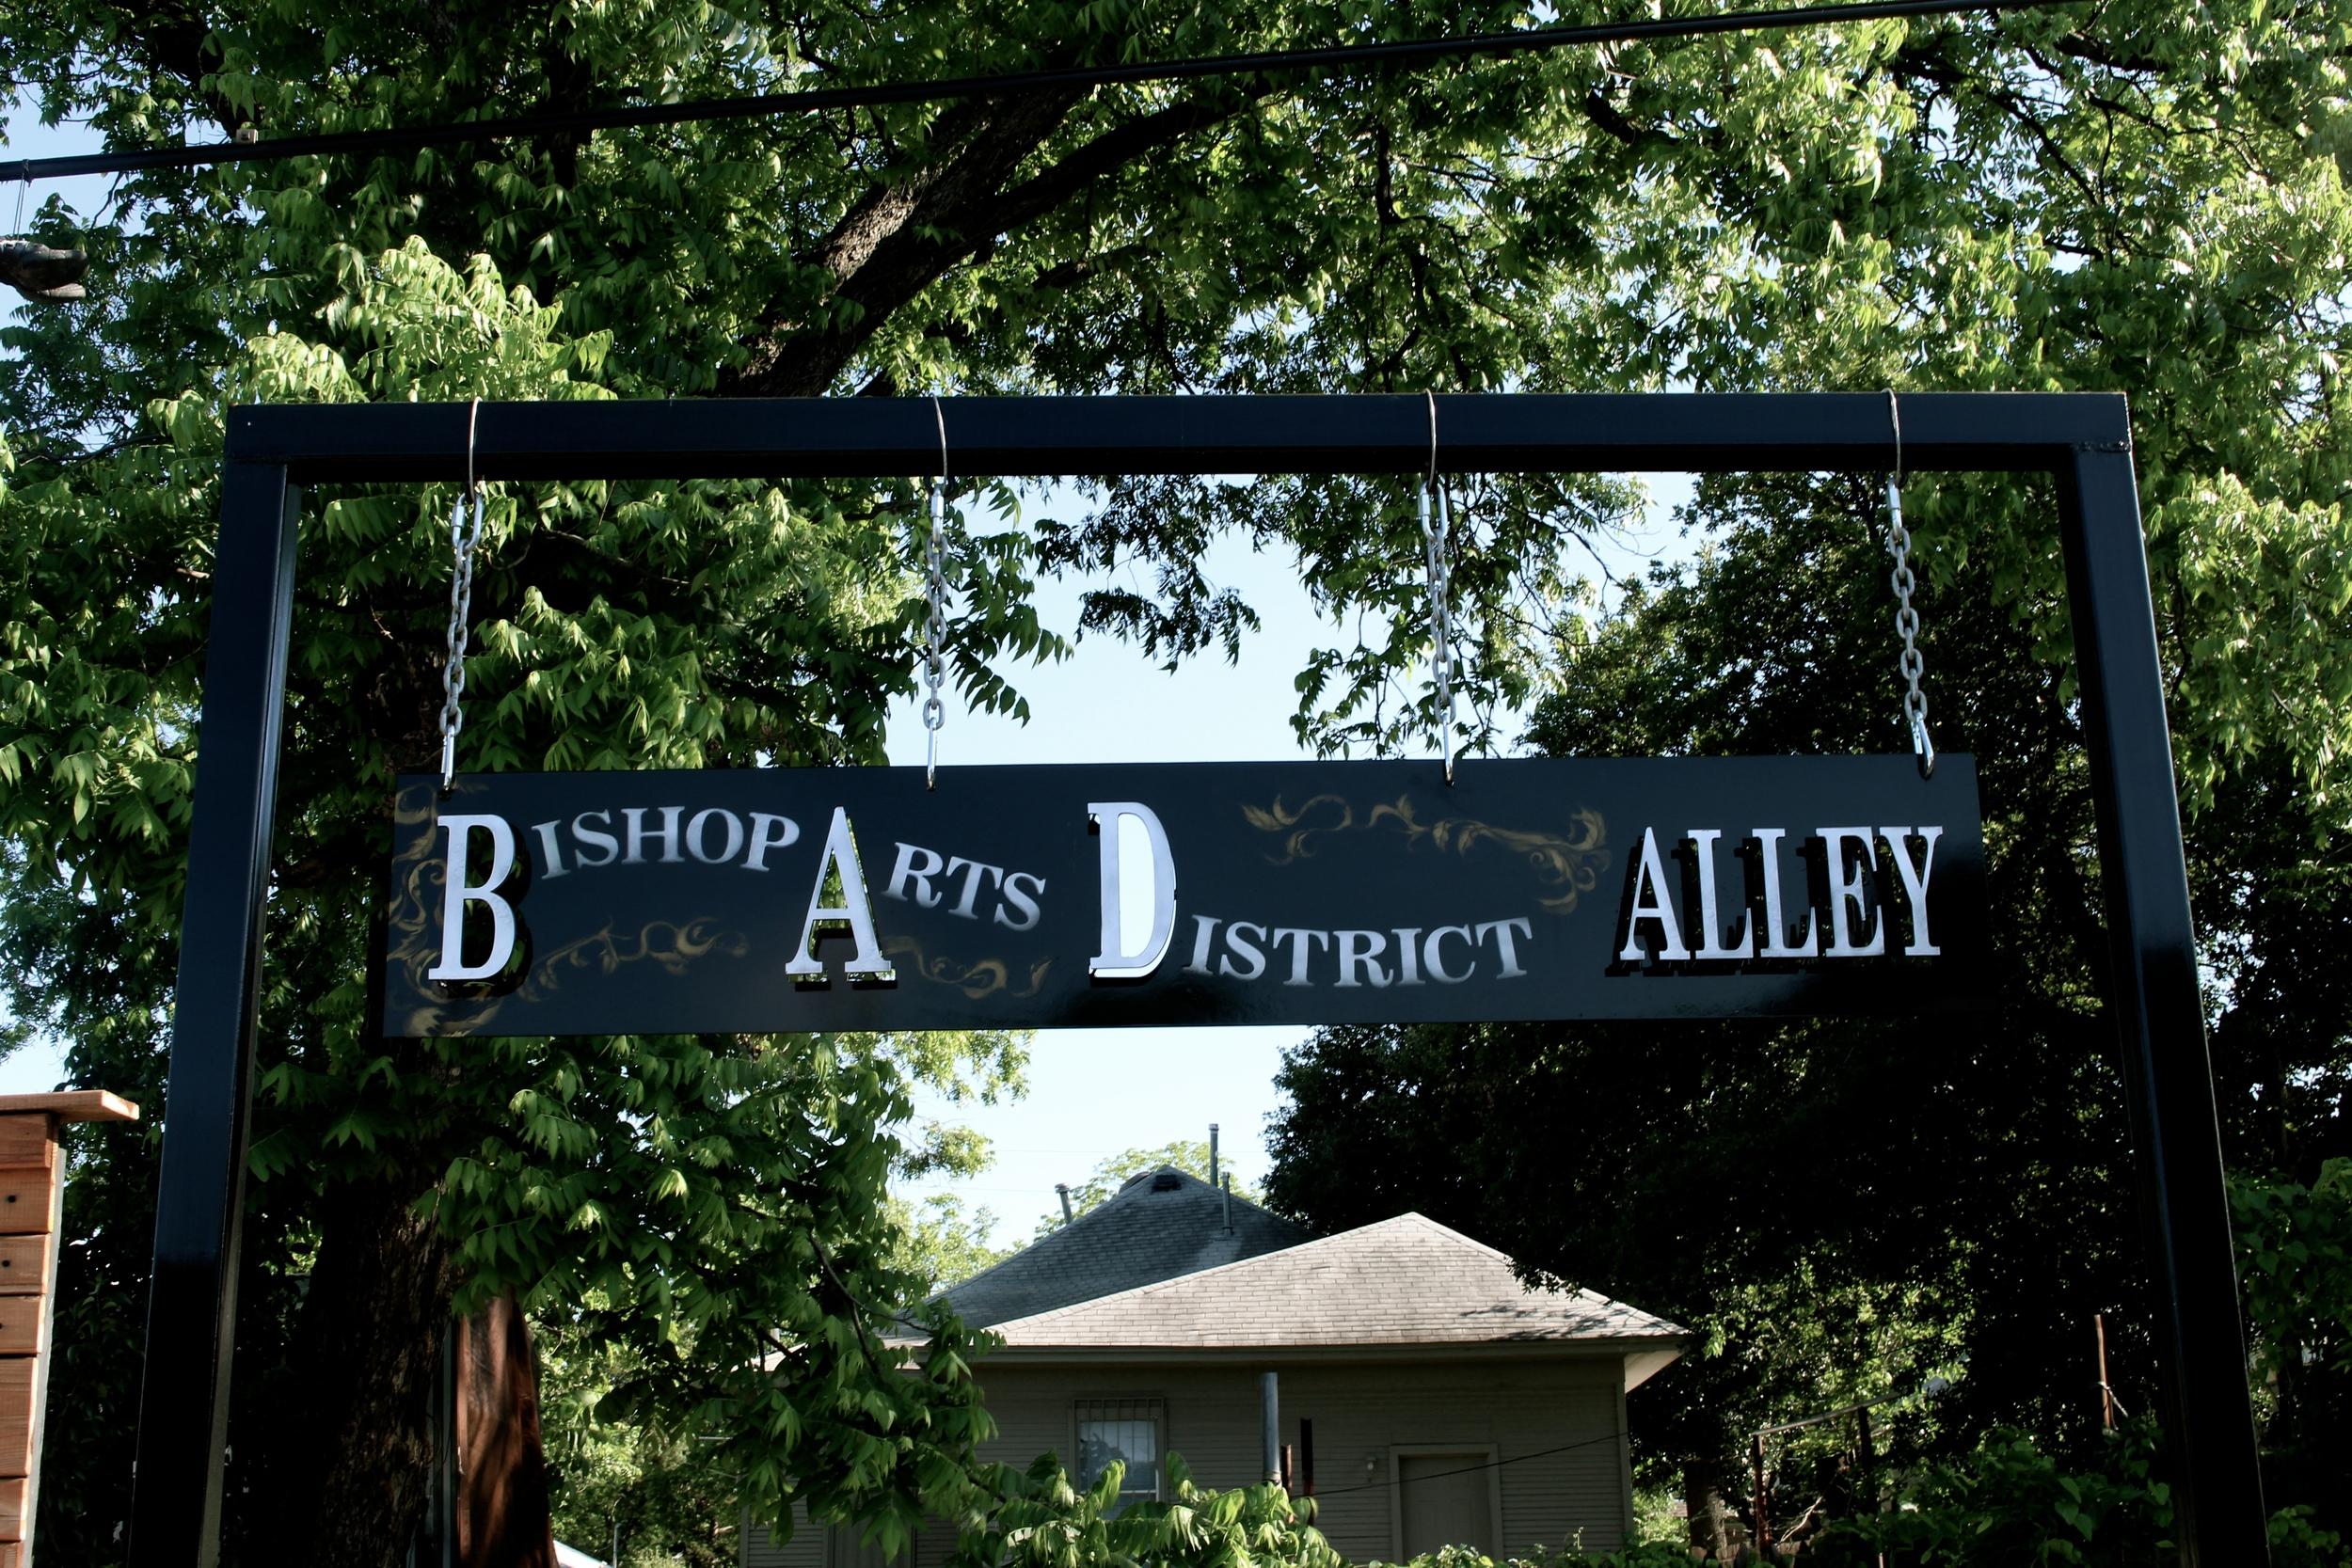 Bishop Arts District | Dallas Travel Guide